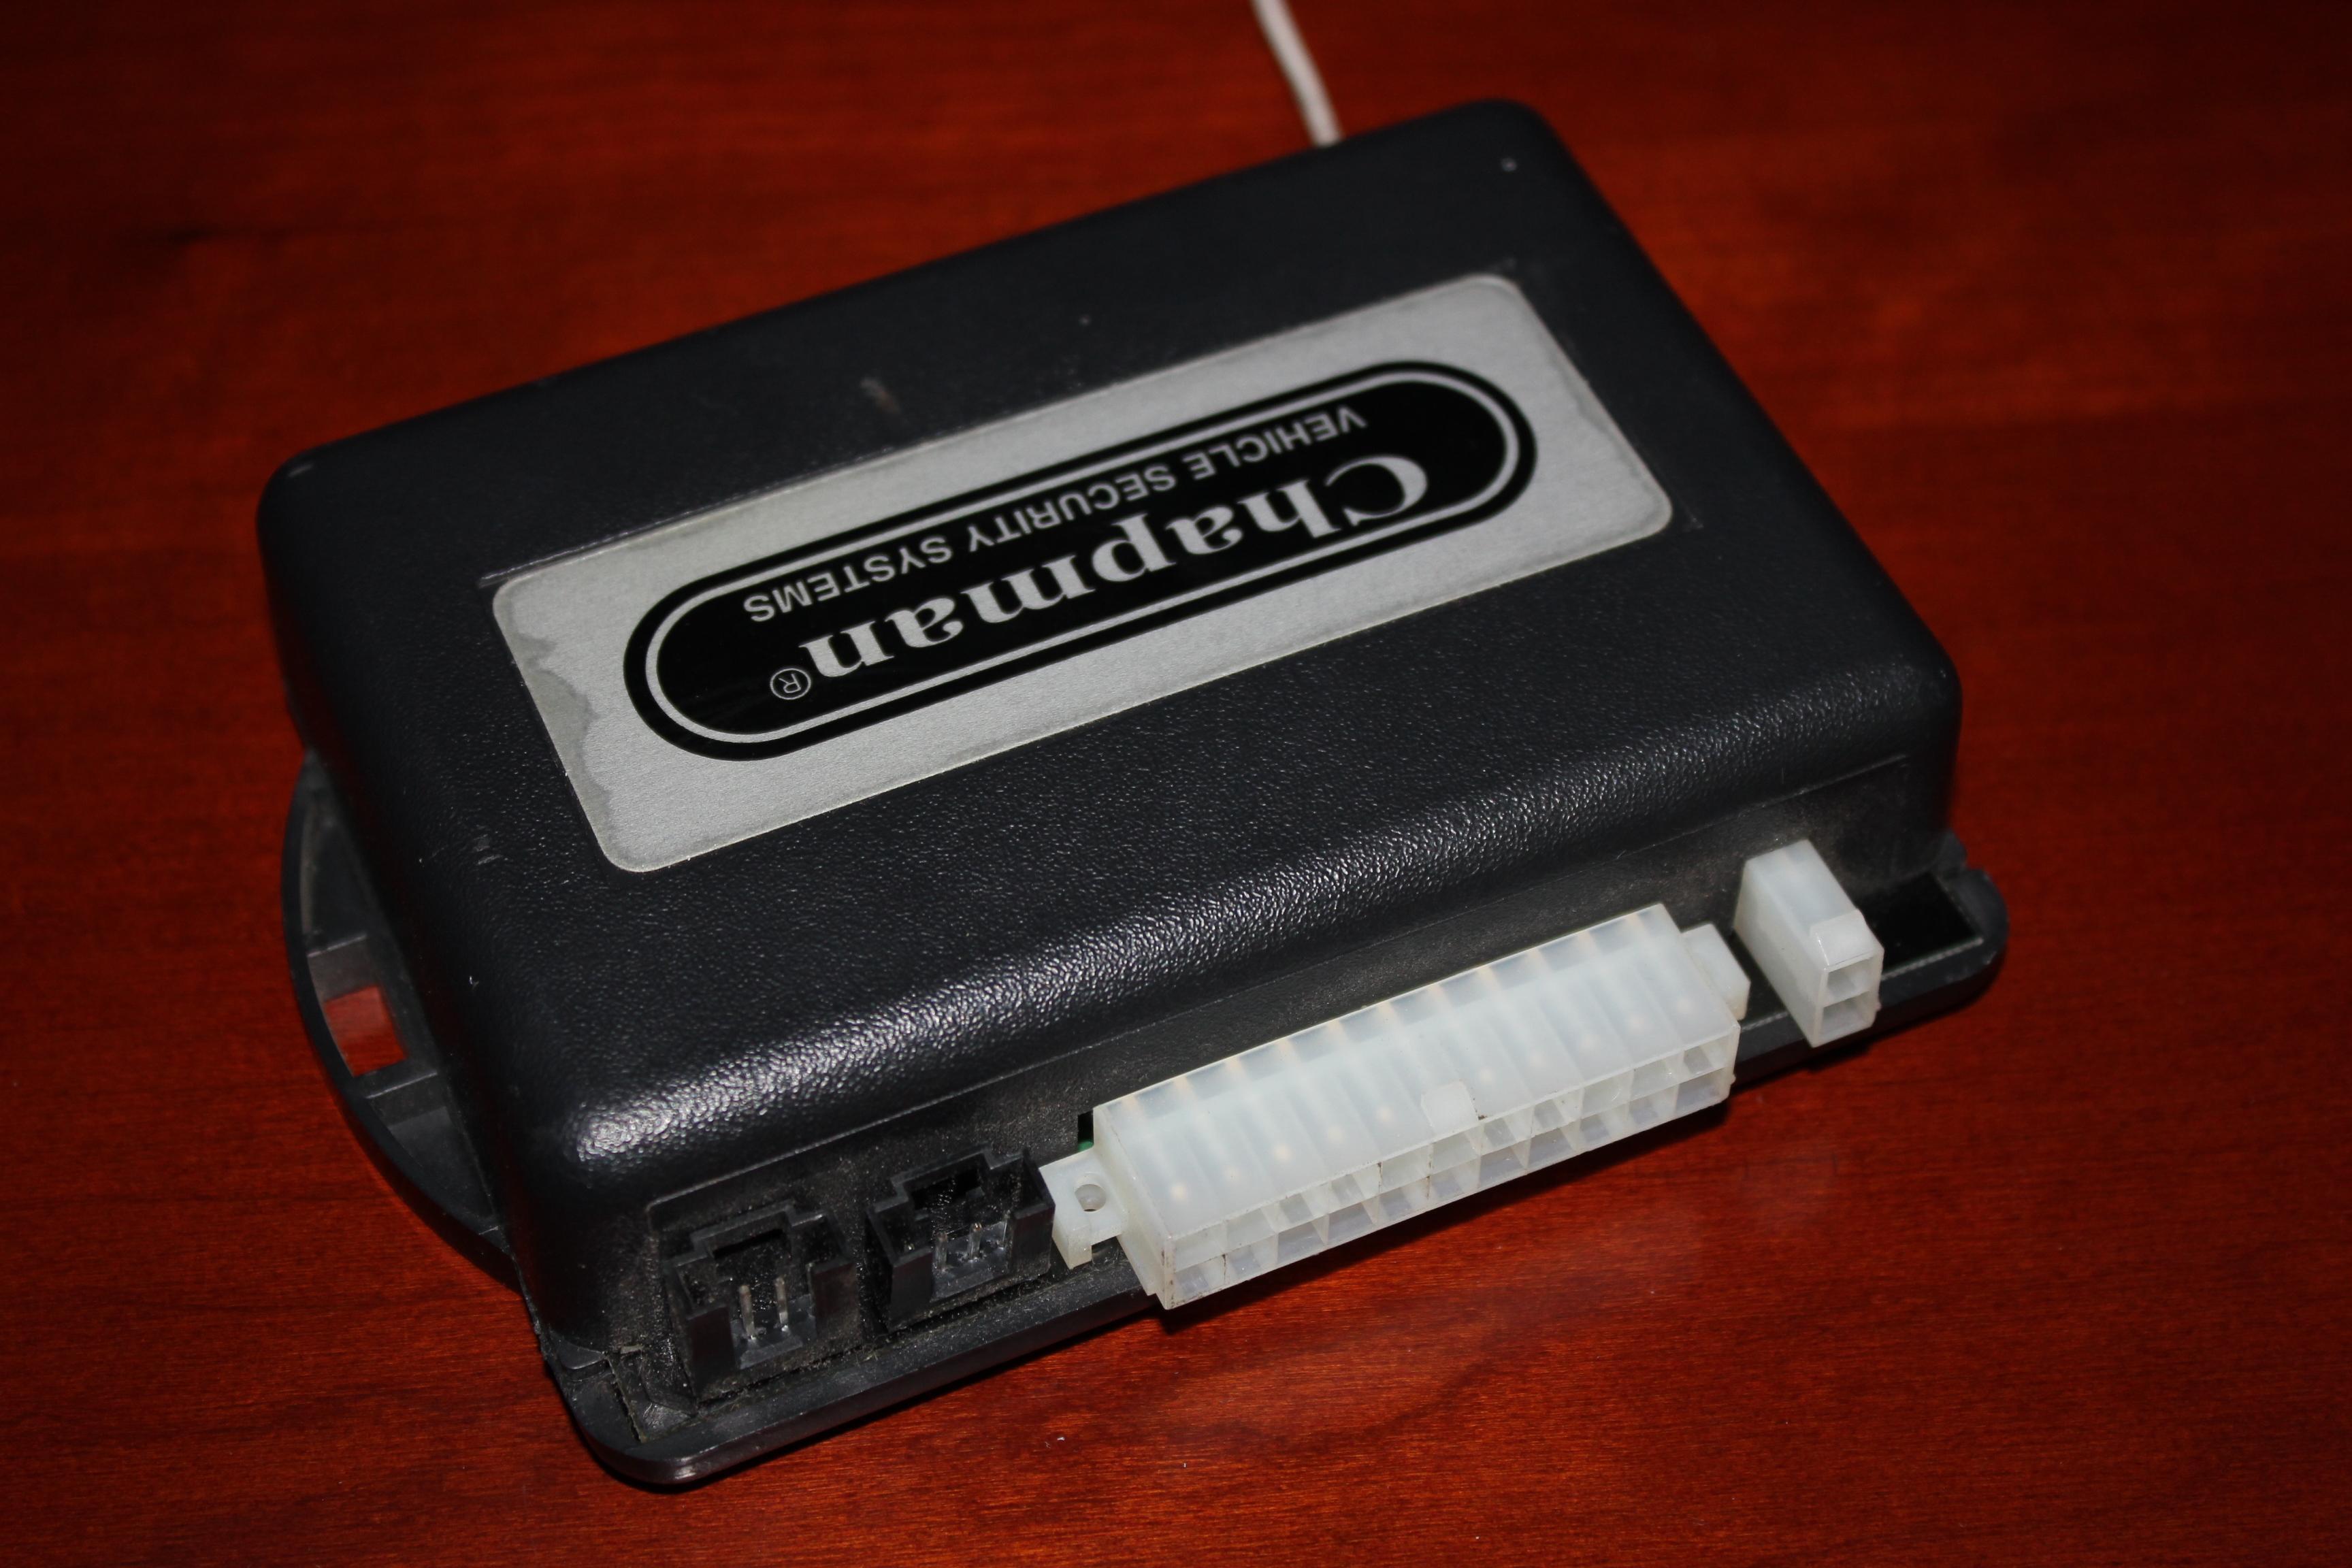 [TVPR_3874]  Chapman Car Alarm Installation Wiring Diagrams - Trx250r Wiring Diagram for Wiring  Diagram Schematics | Chapman Security System Wiring Diagram |  | Wiring Diagram Schematics